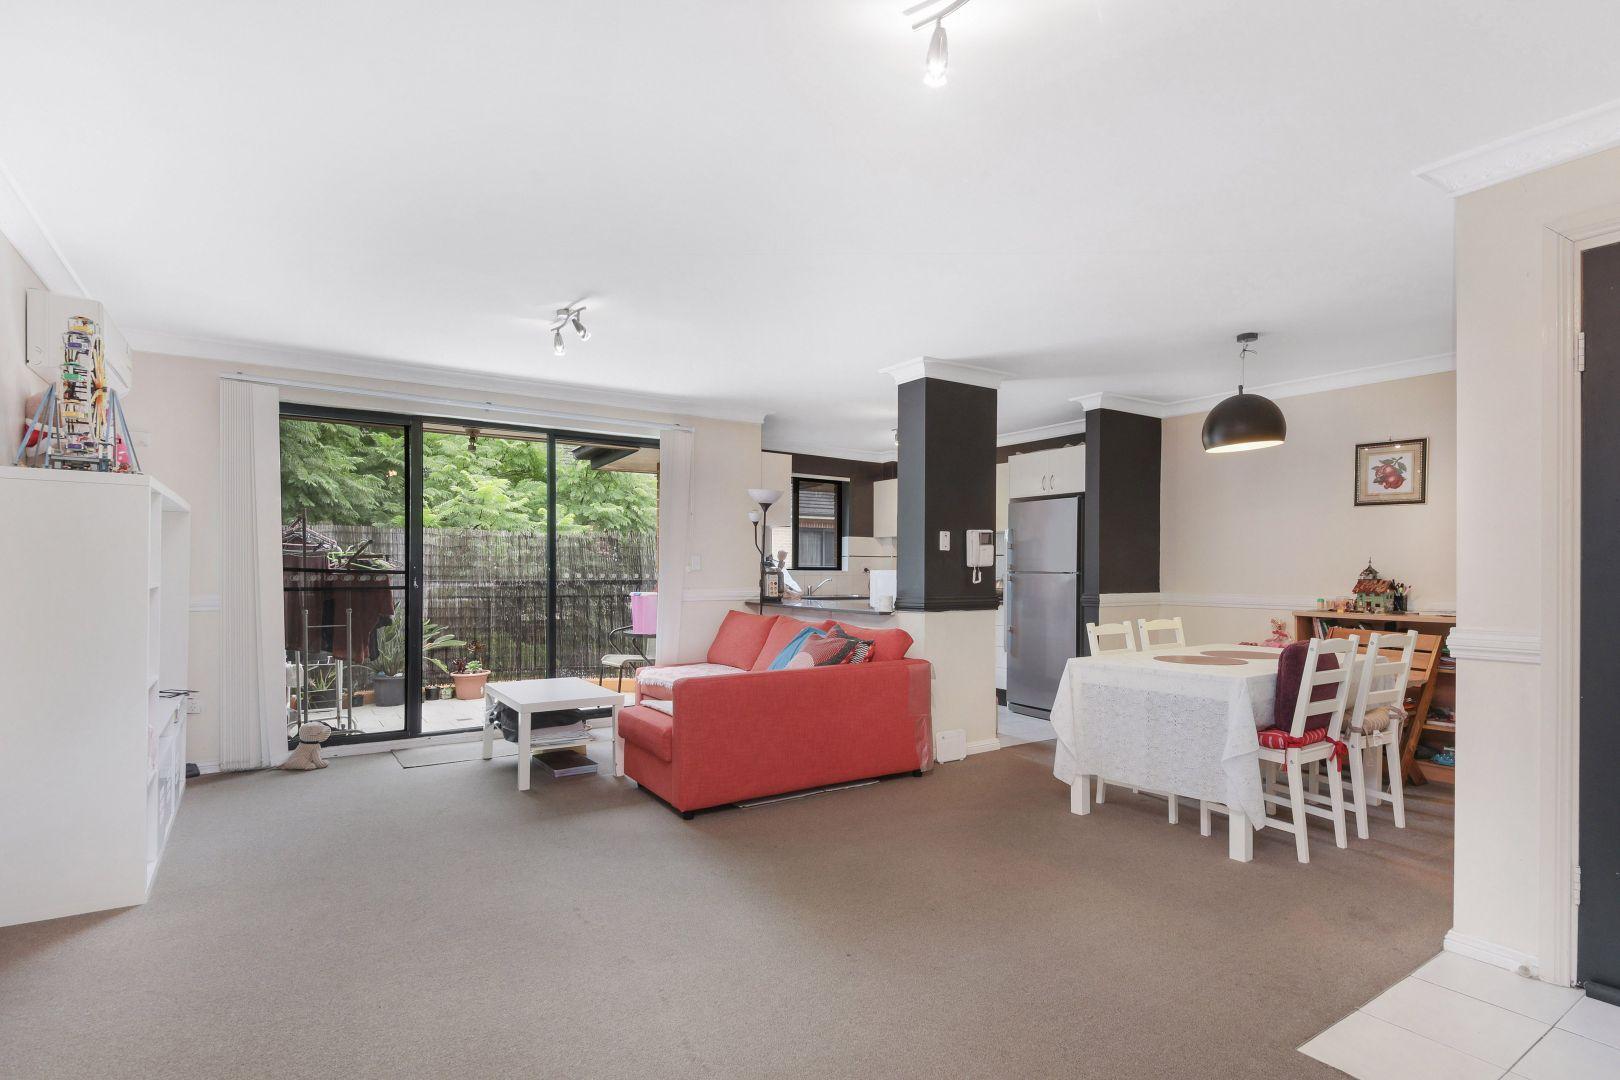 23/1-7 Belmore, North Parramatta NSW 2151, Image 1